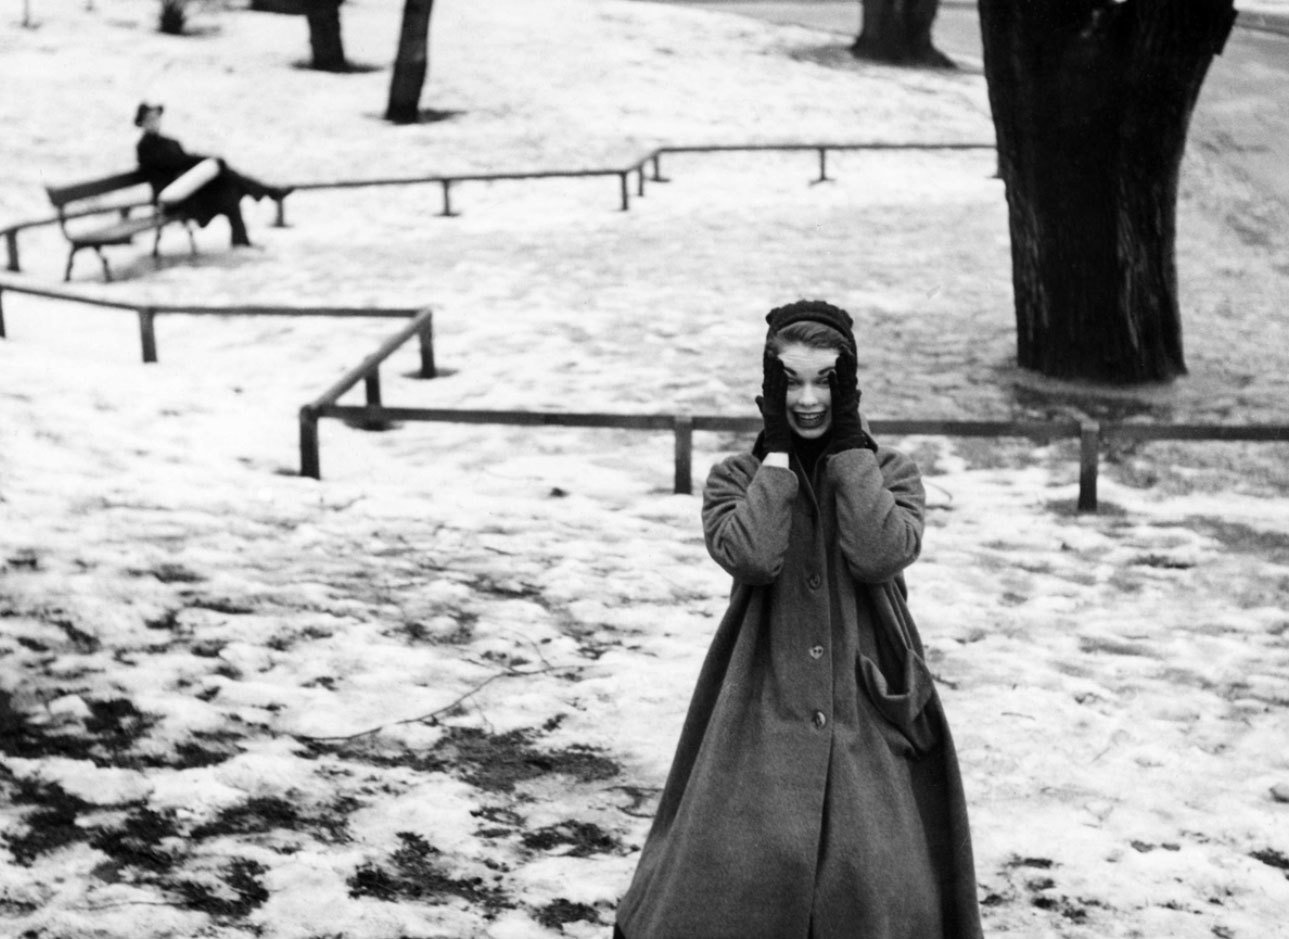 A model shows winter fashion in Stockholm, 1950, Sten Didrik Bellander, Stiftelsen Nordiska museet, CC BY-NC-ND